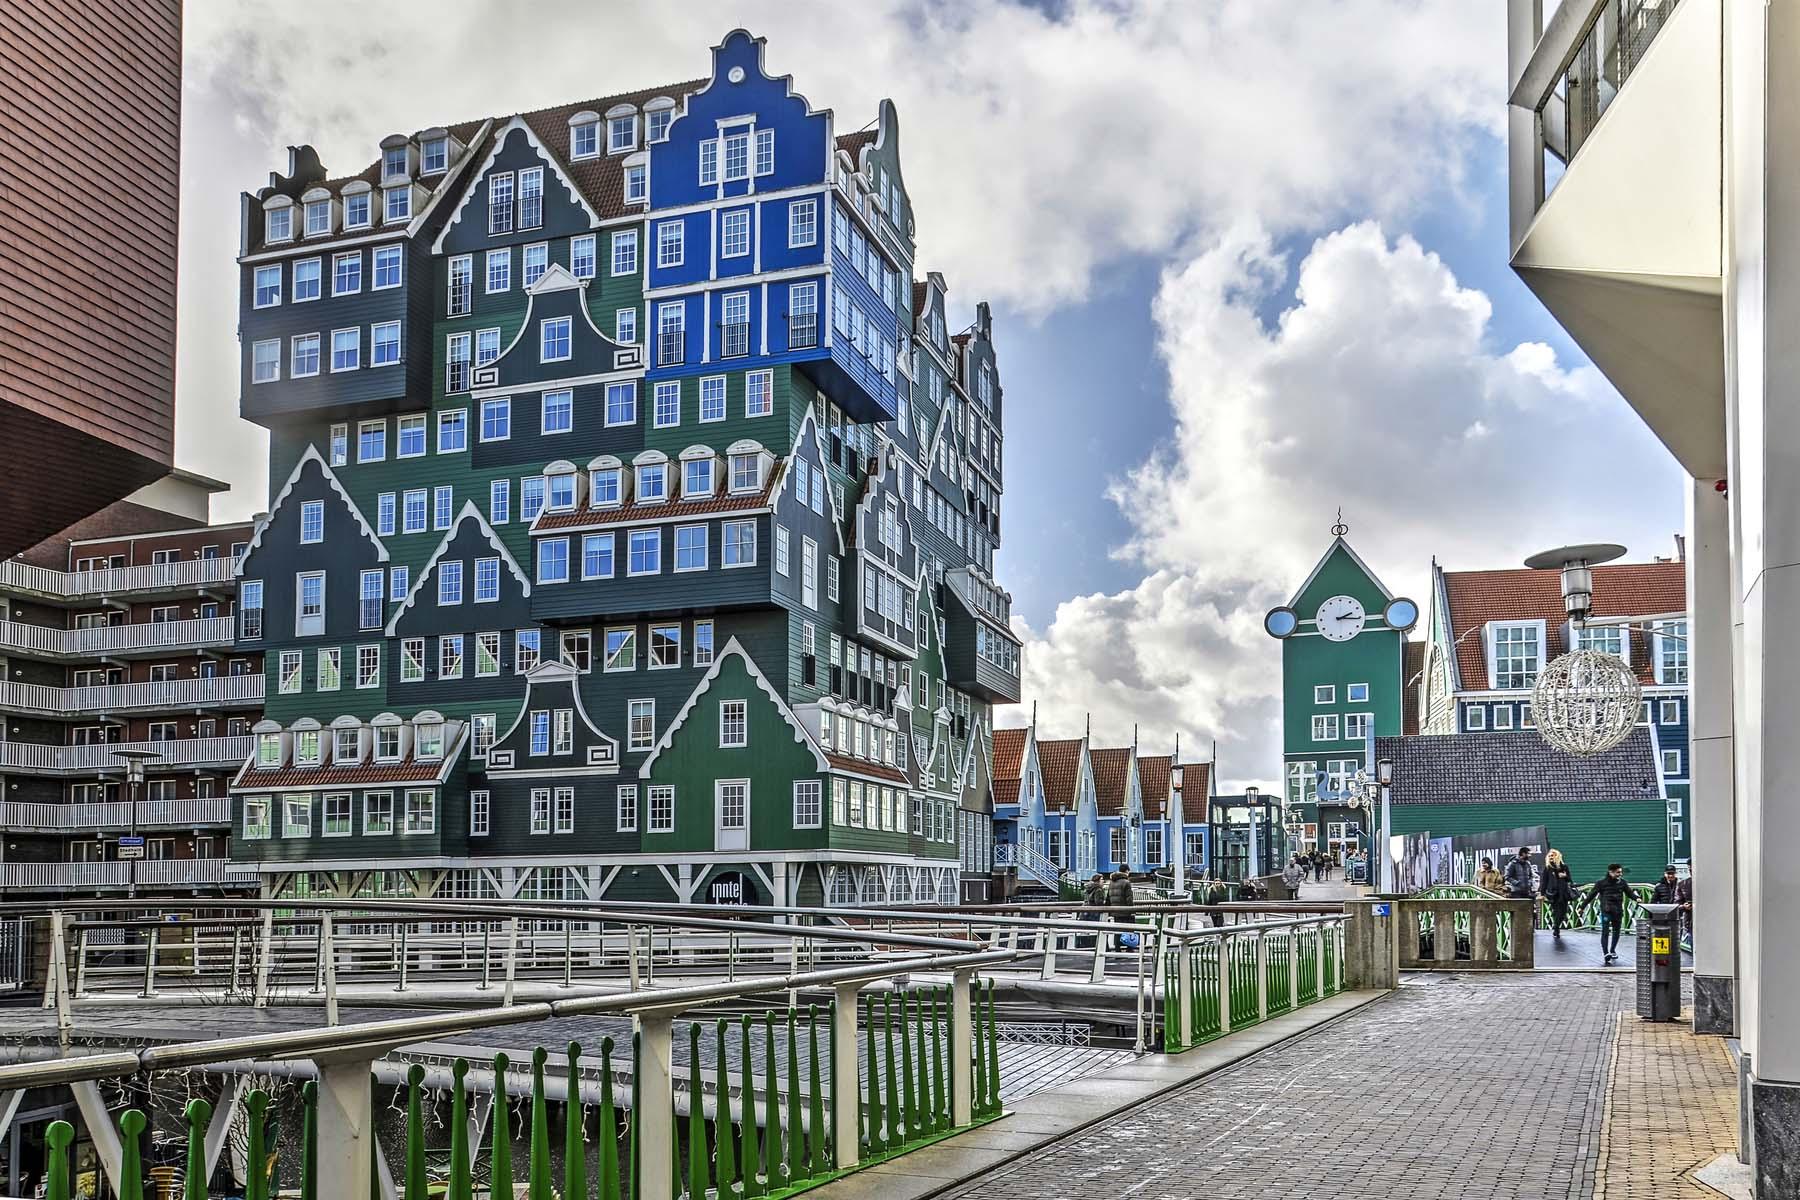 Cities close to Amsterdam: Zaandam